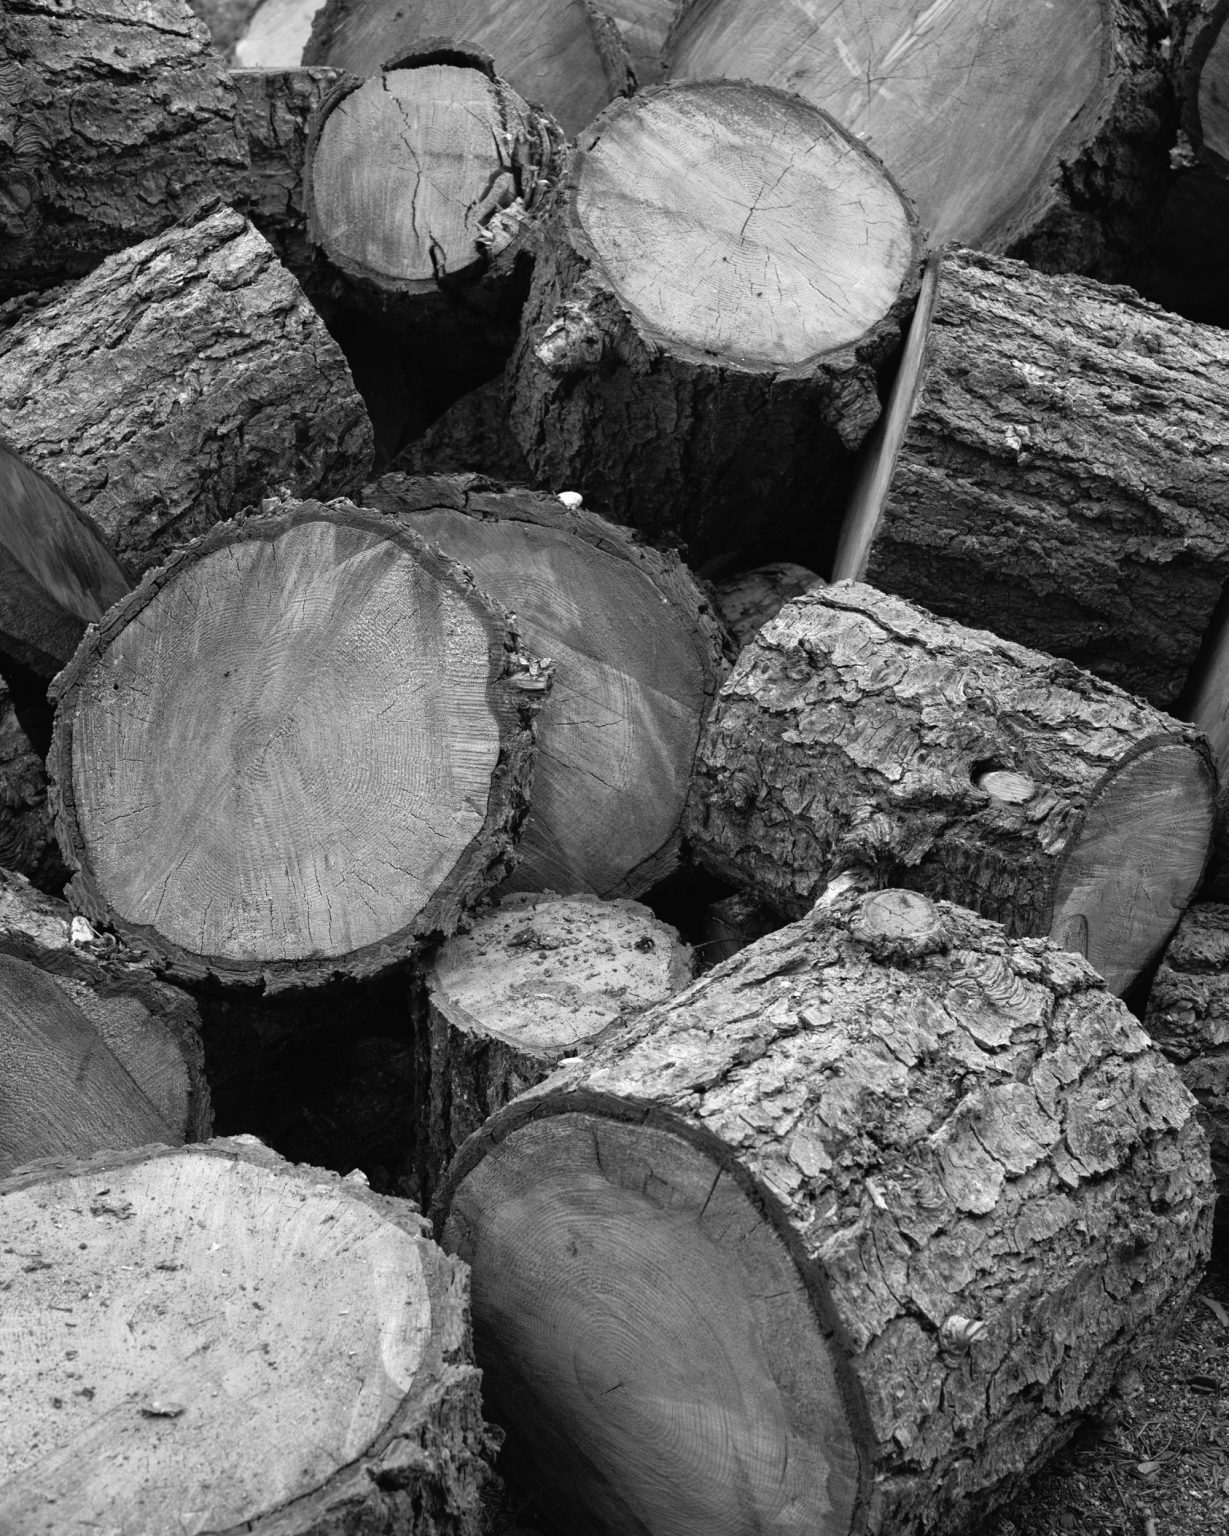 Pile of cut trees. California 2019